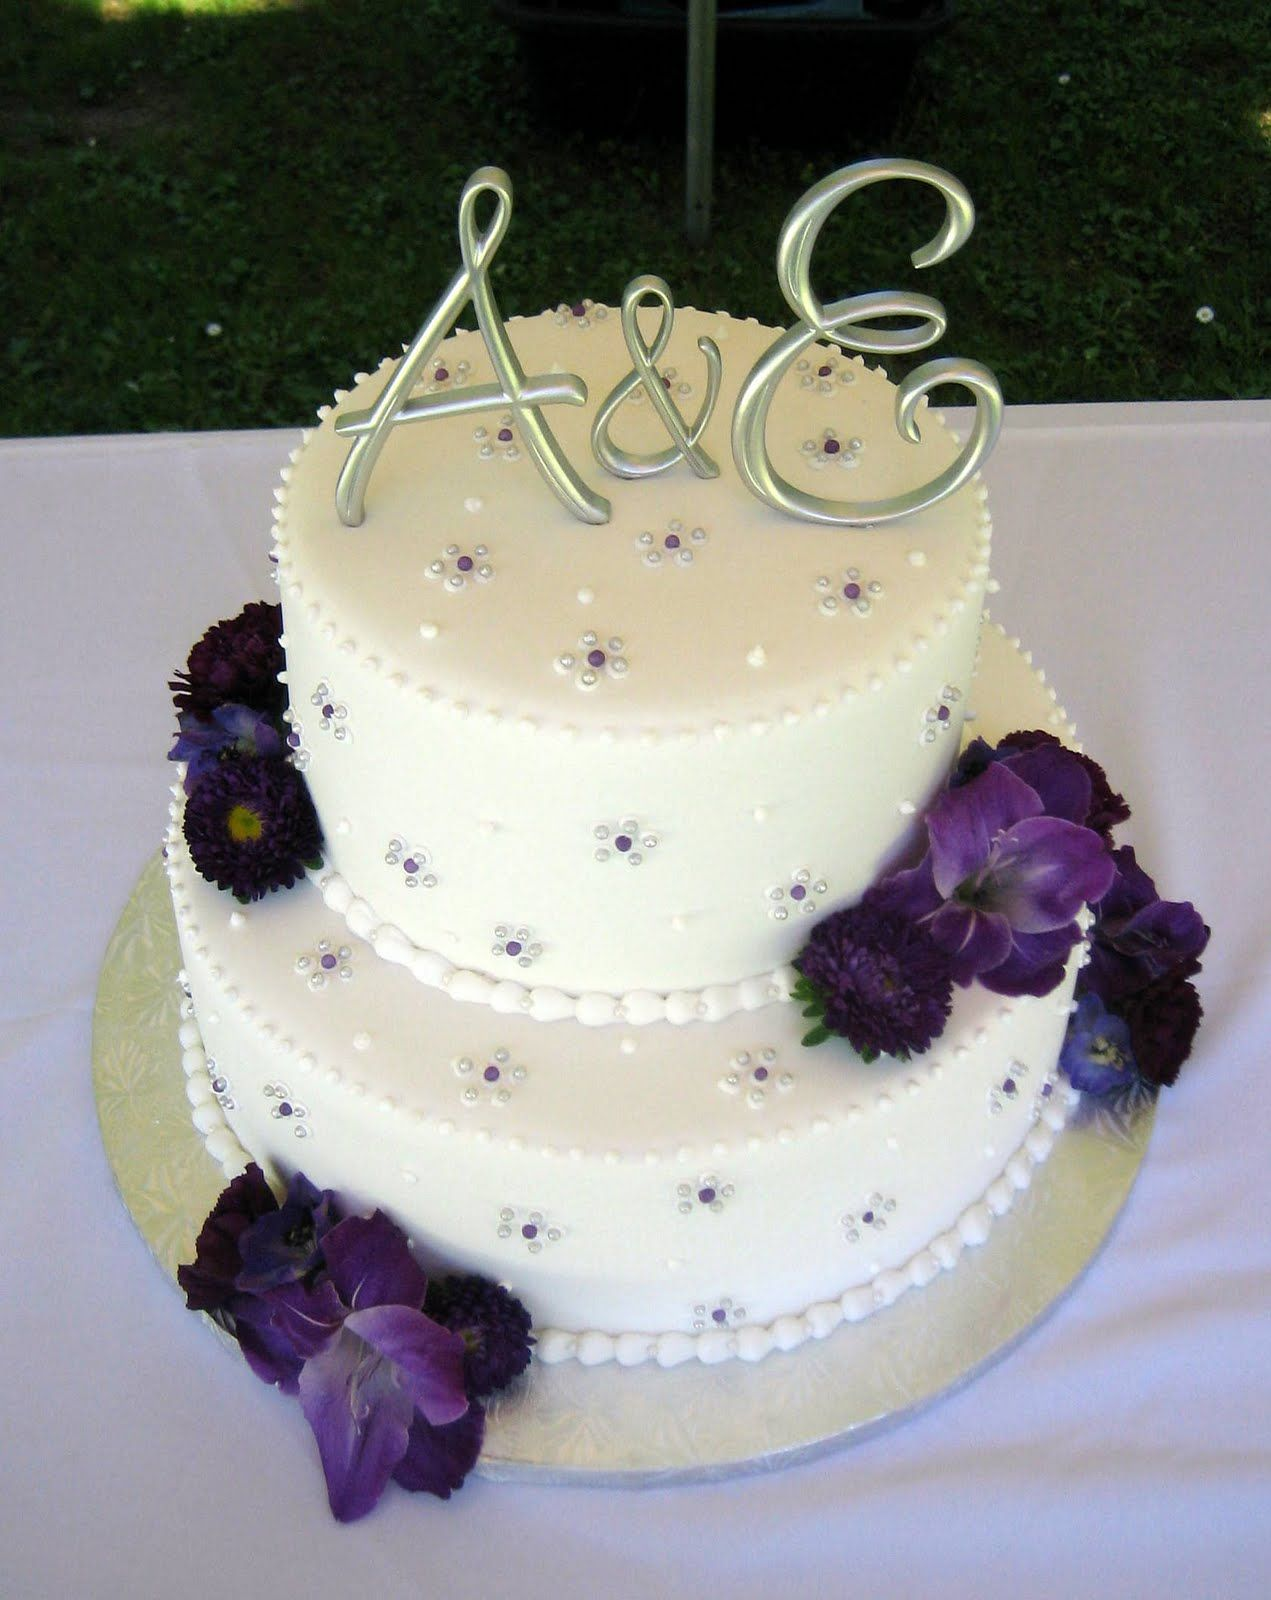 Three Purple Wedding Cakes With Images Purple Wedding Cakes